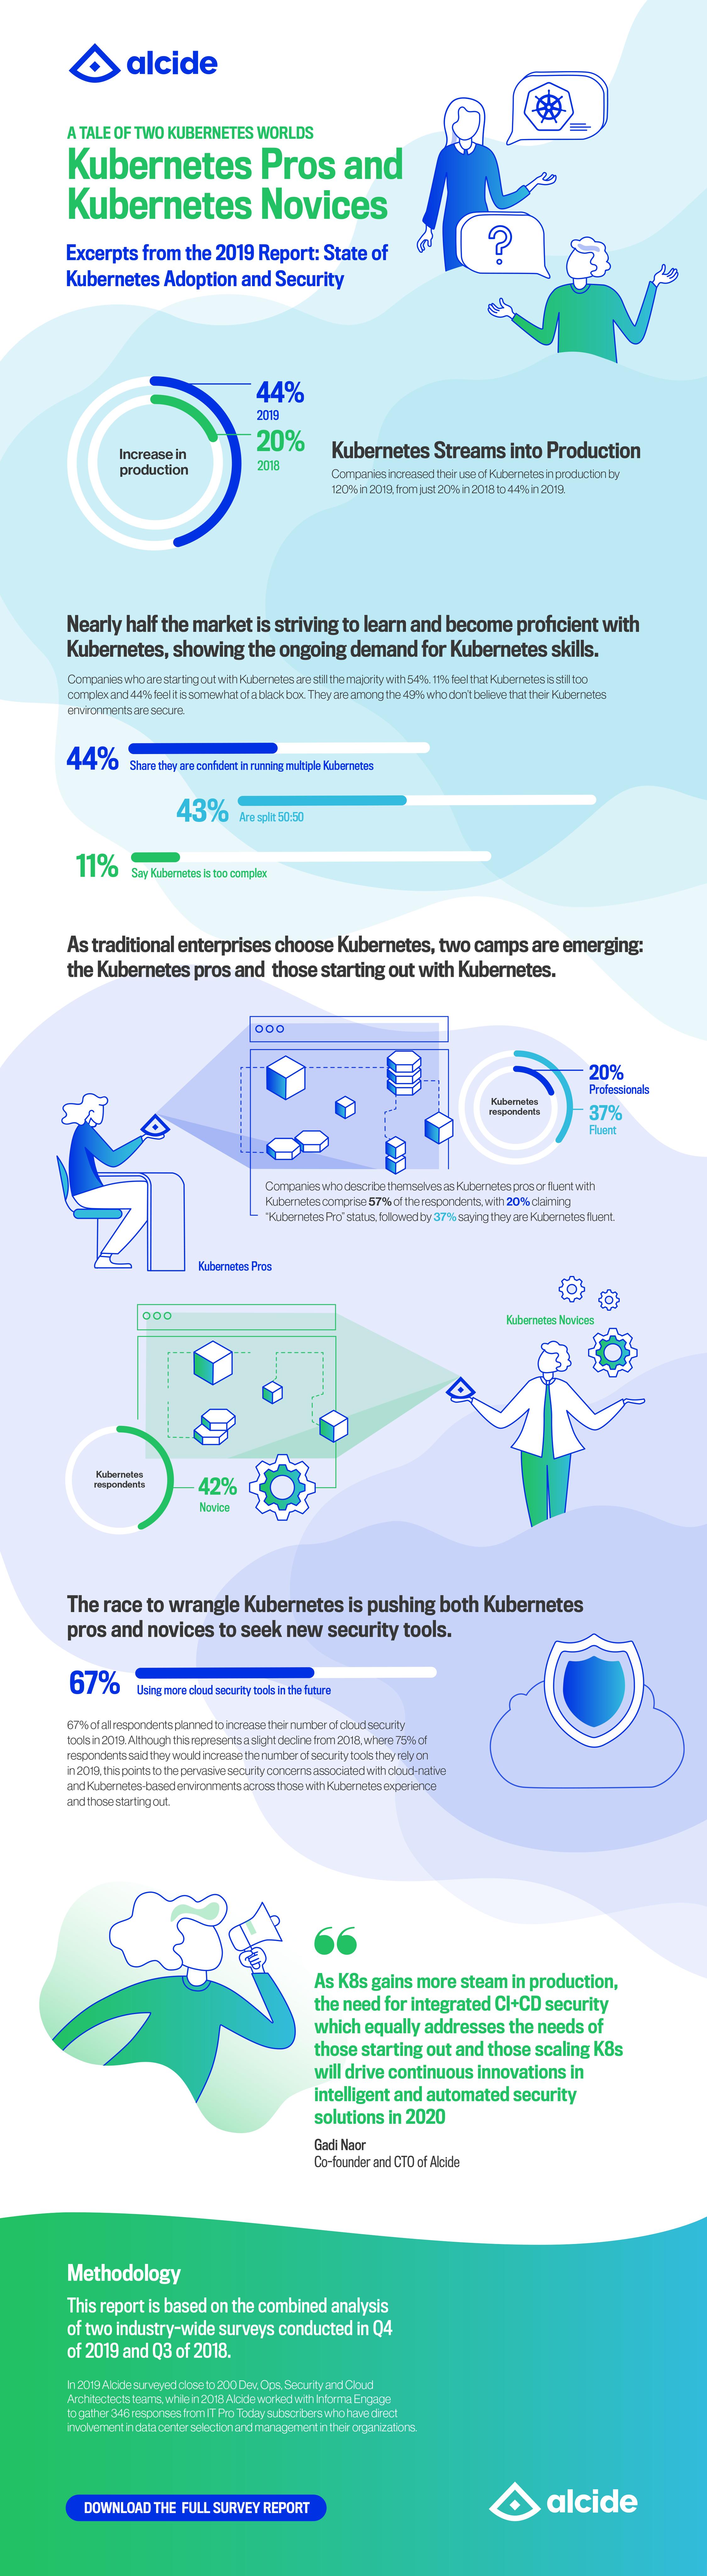 alcide_infographic_022020